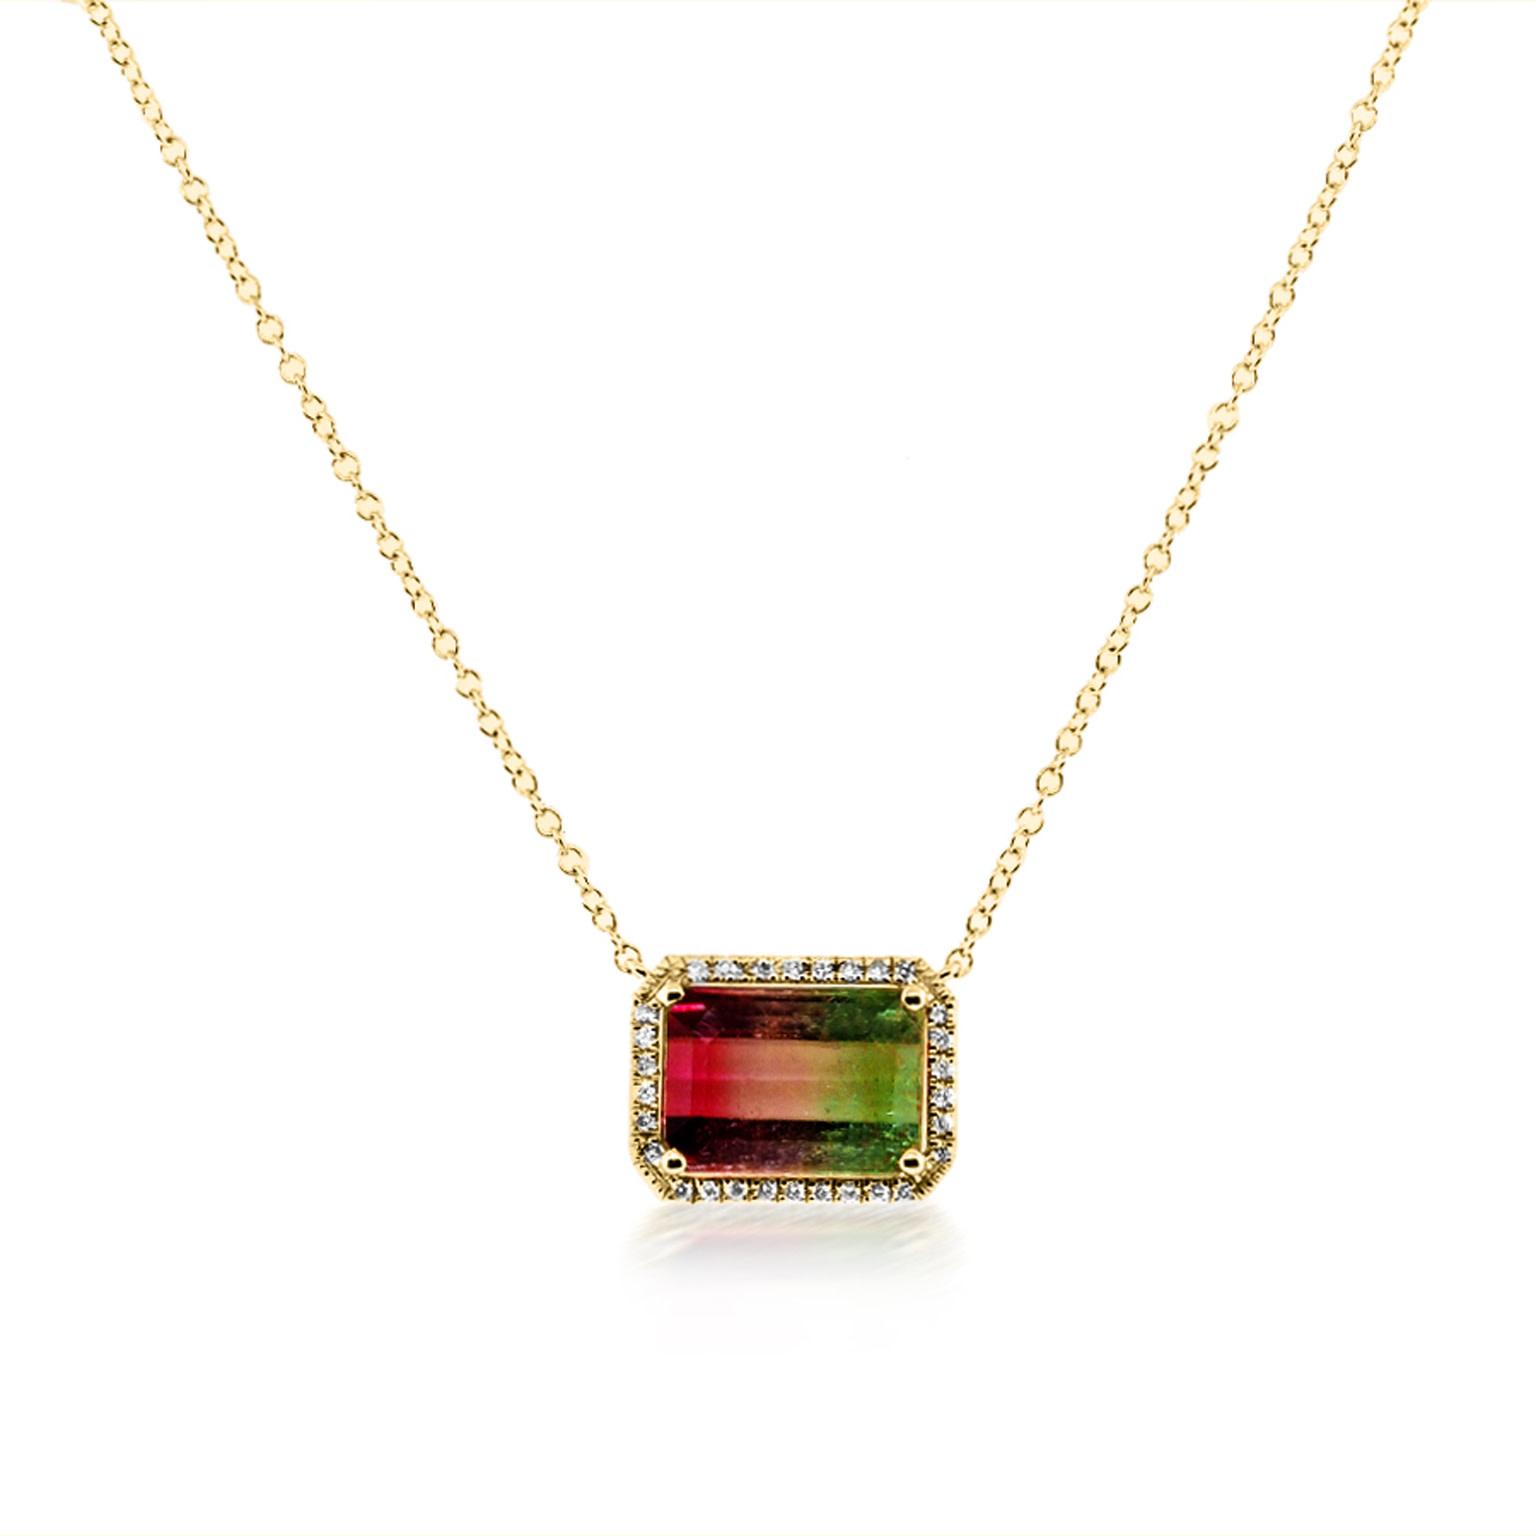 Bicolor Tourmaline and Diamond Necklace